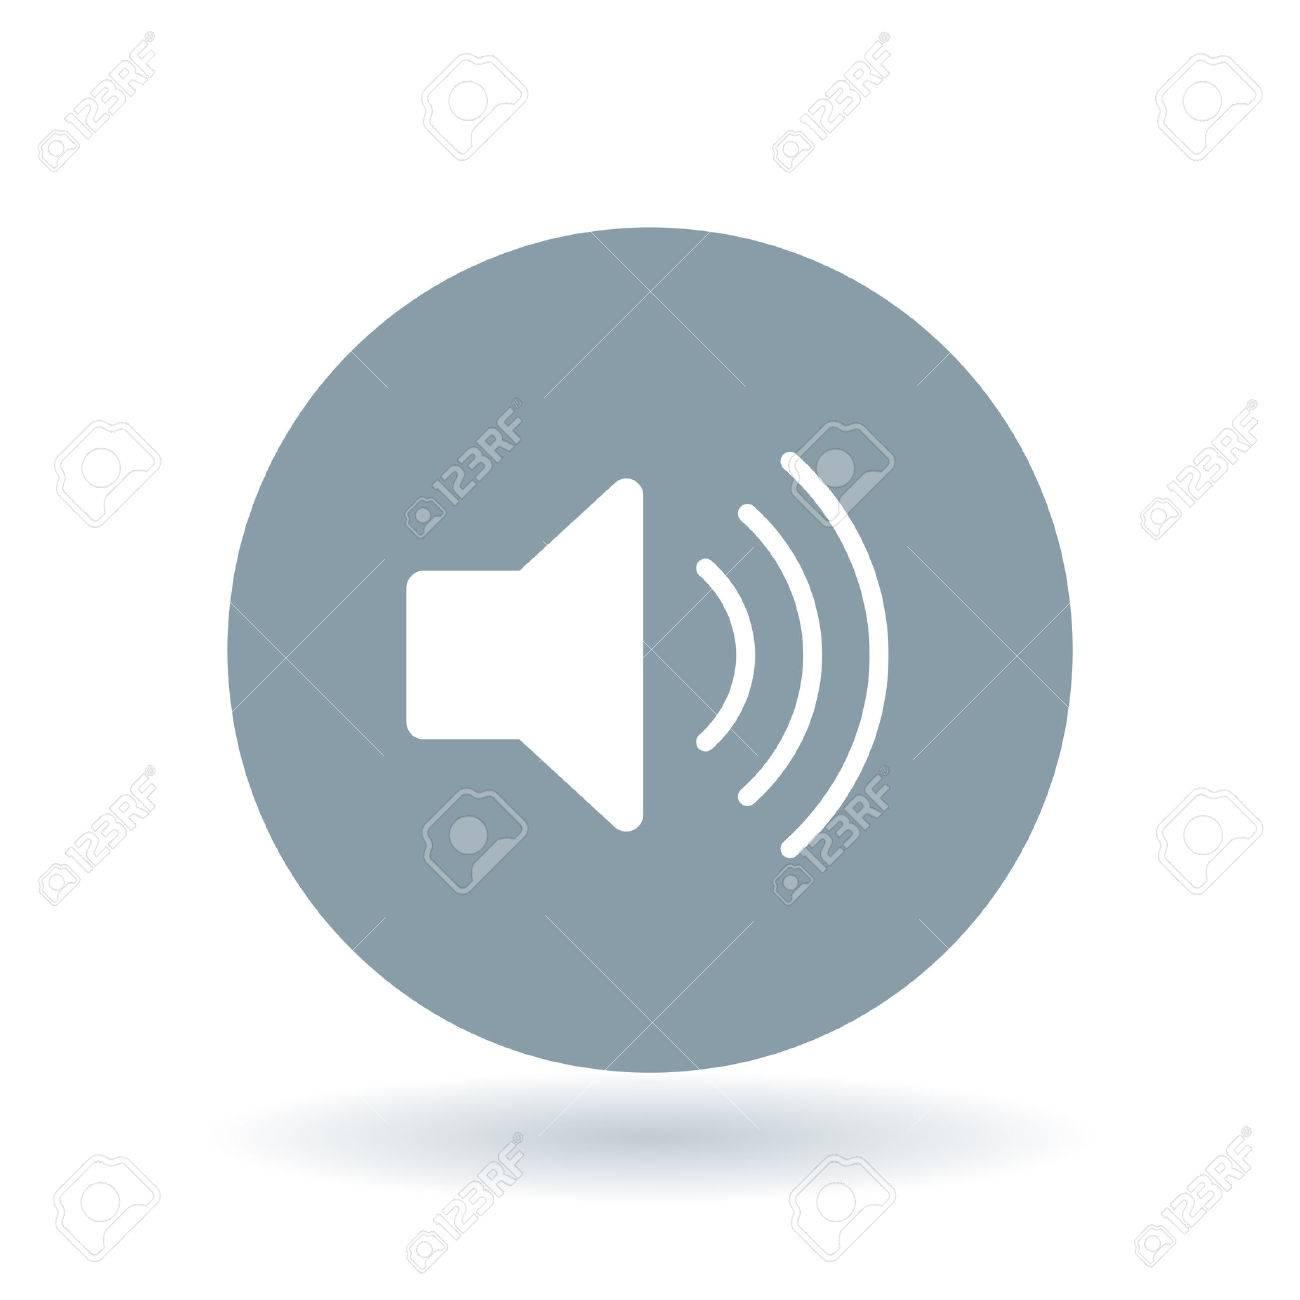 Audio icon. Speaker sign. Volume symbol. White volume icon on cool grey circle background. Vector illustration. - 52803074